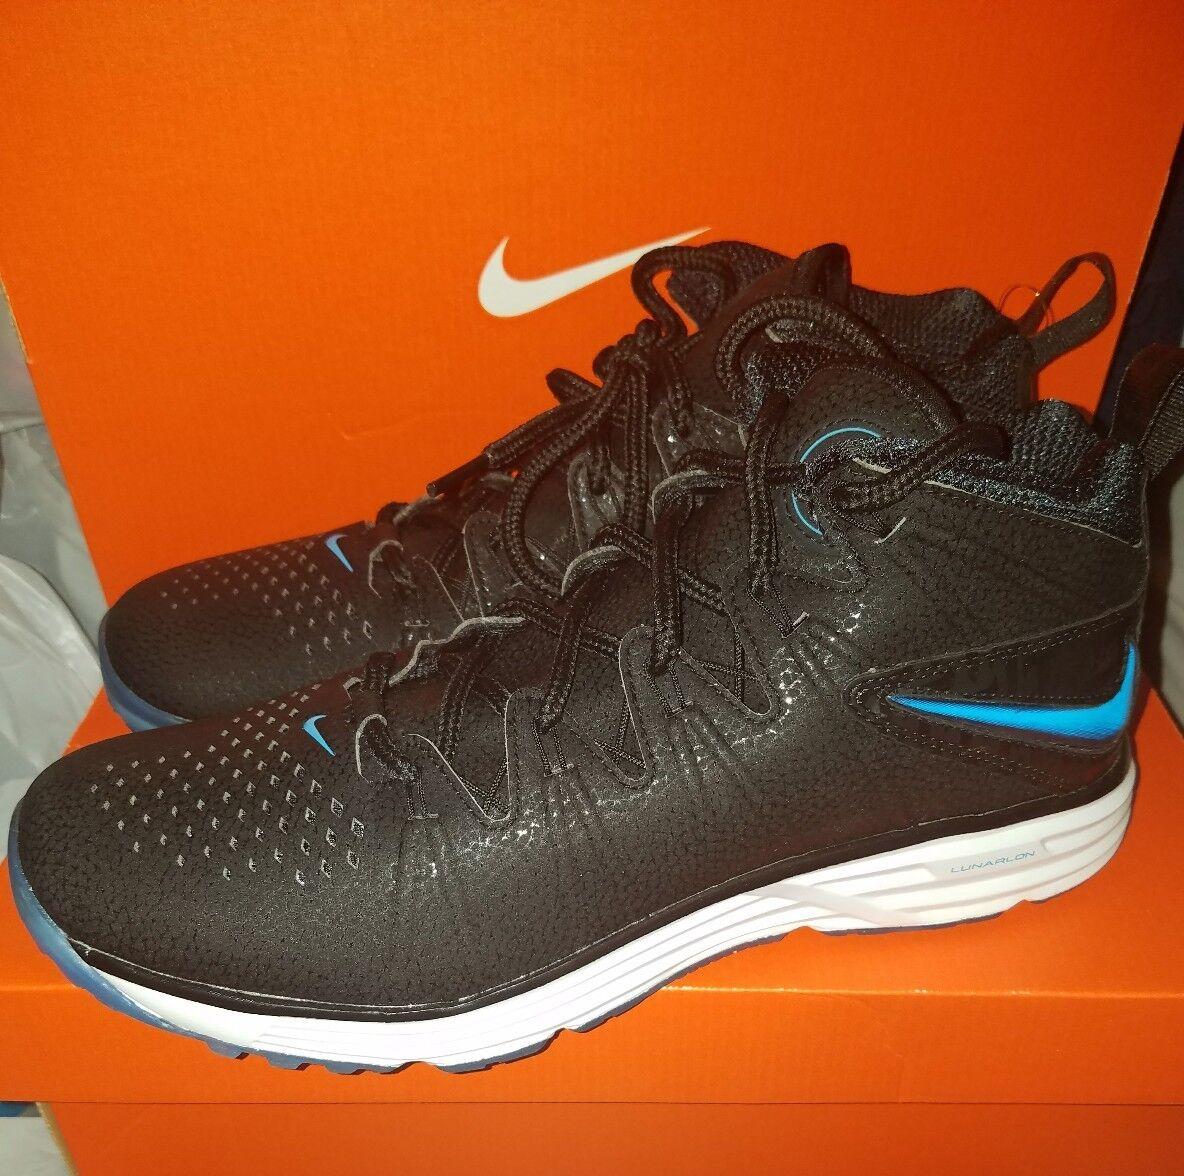 Nike huarache 4 aeroporto elite territorio scarpe blu numero nero 807118 040 uomo numero blu 9 407436